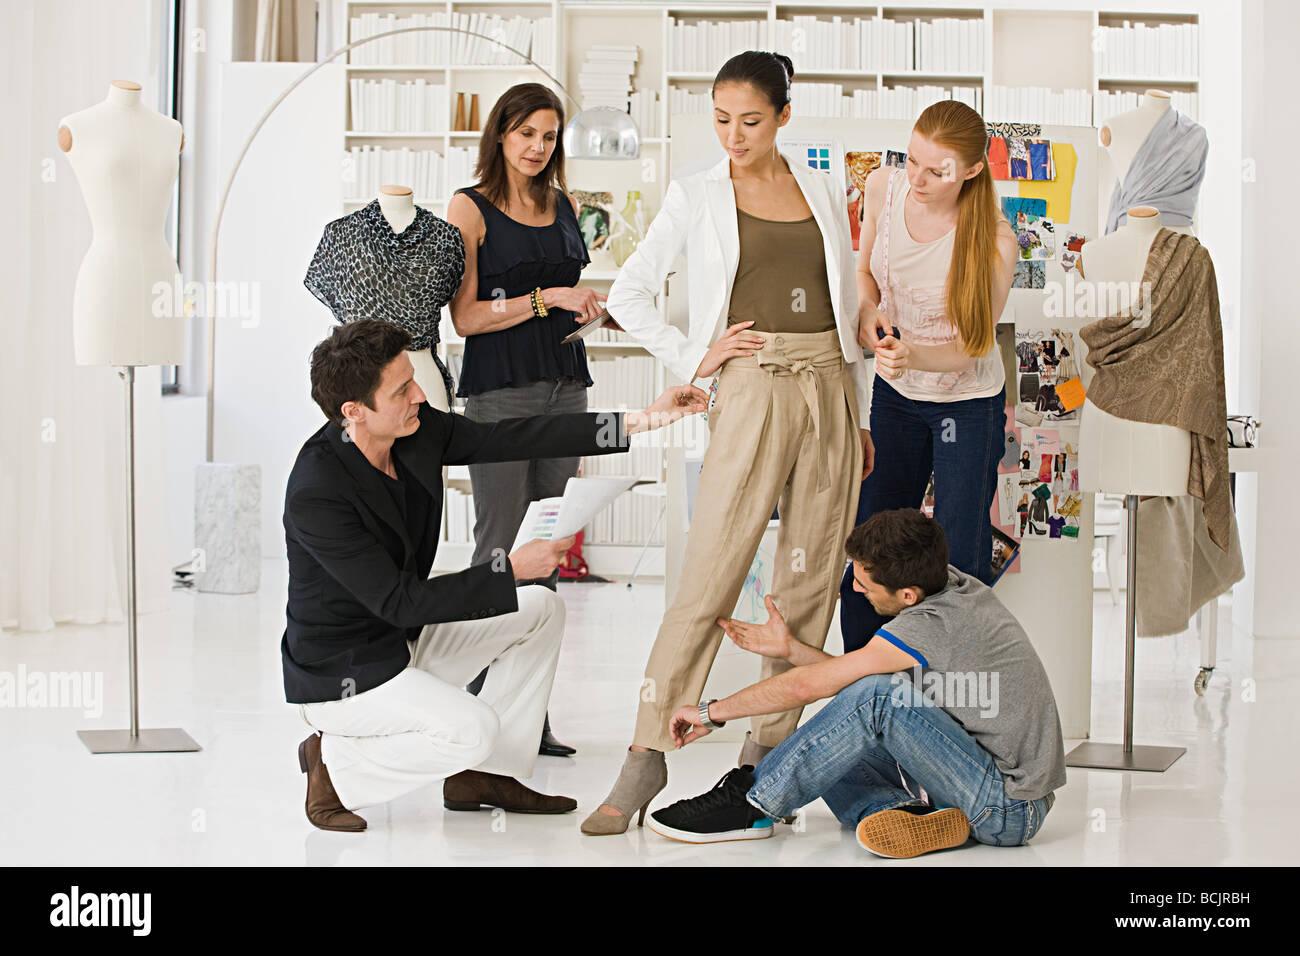 fashion designers at work stock photo 24999733 alamyfashion designers at work